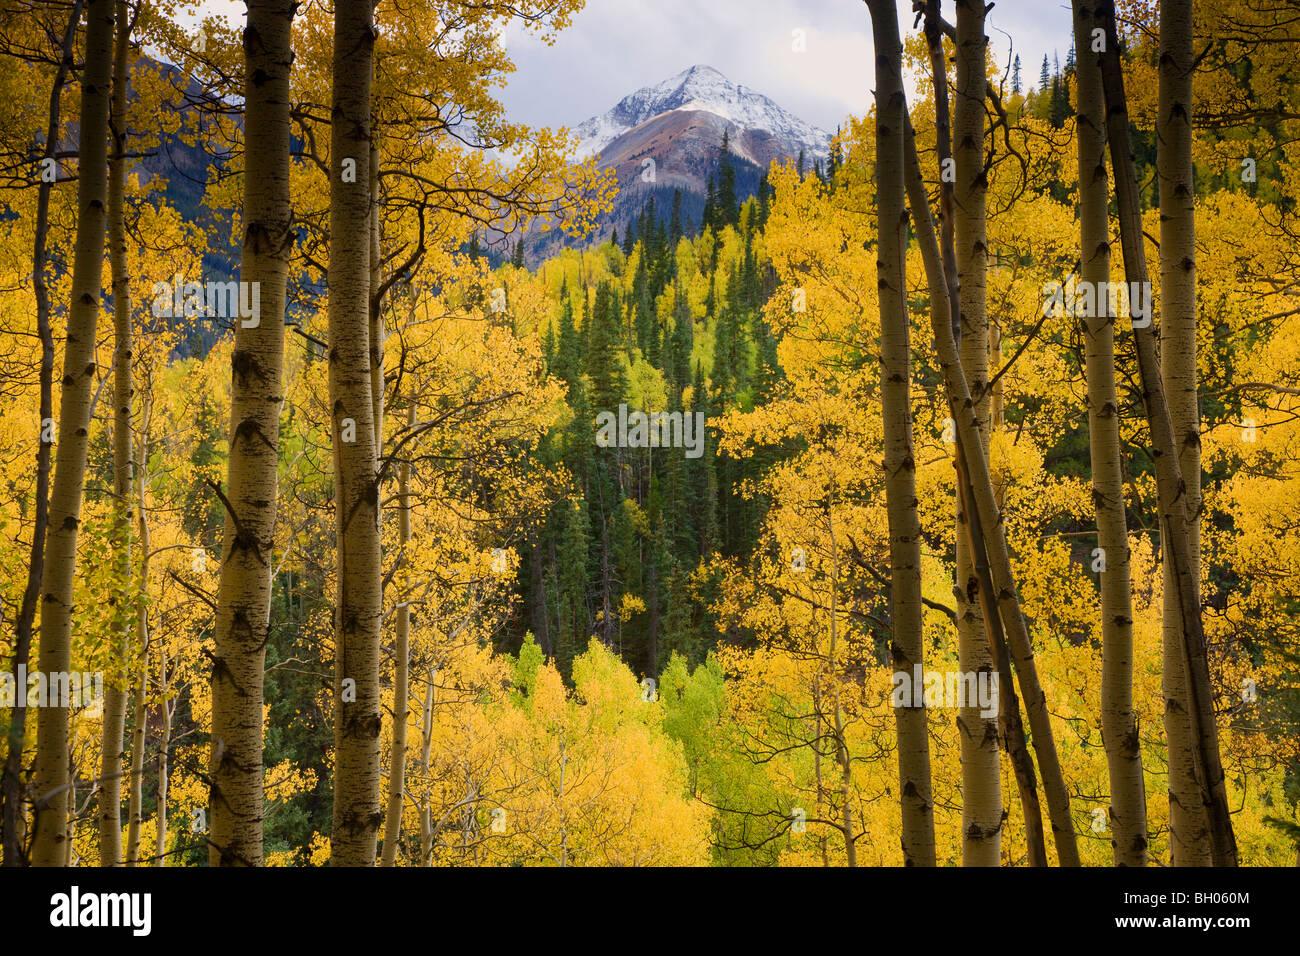 Fall colors along Henson Creek Road to Engineer Pass, San Juan Mountains, Colorado. - Stock Image